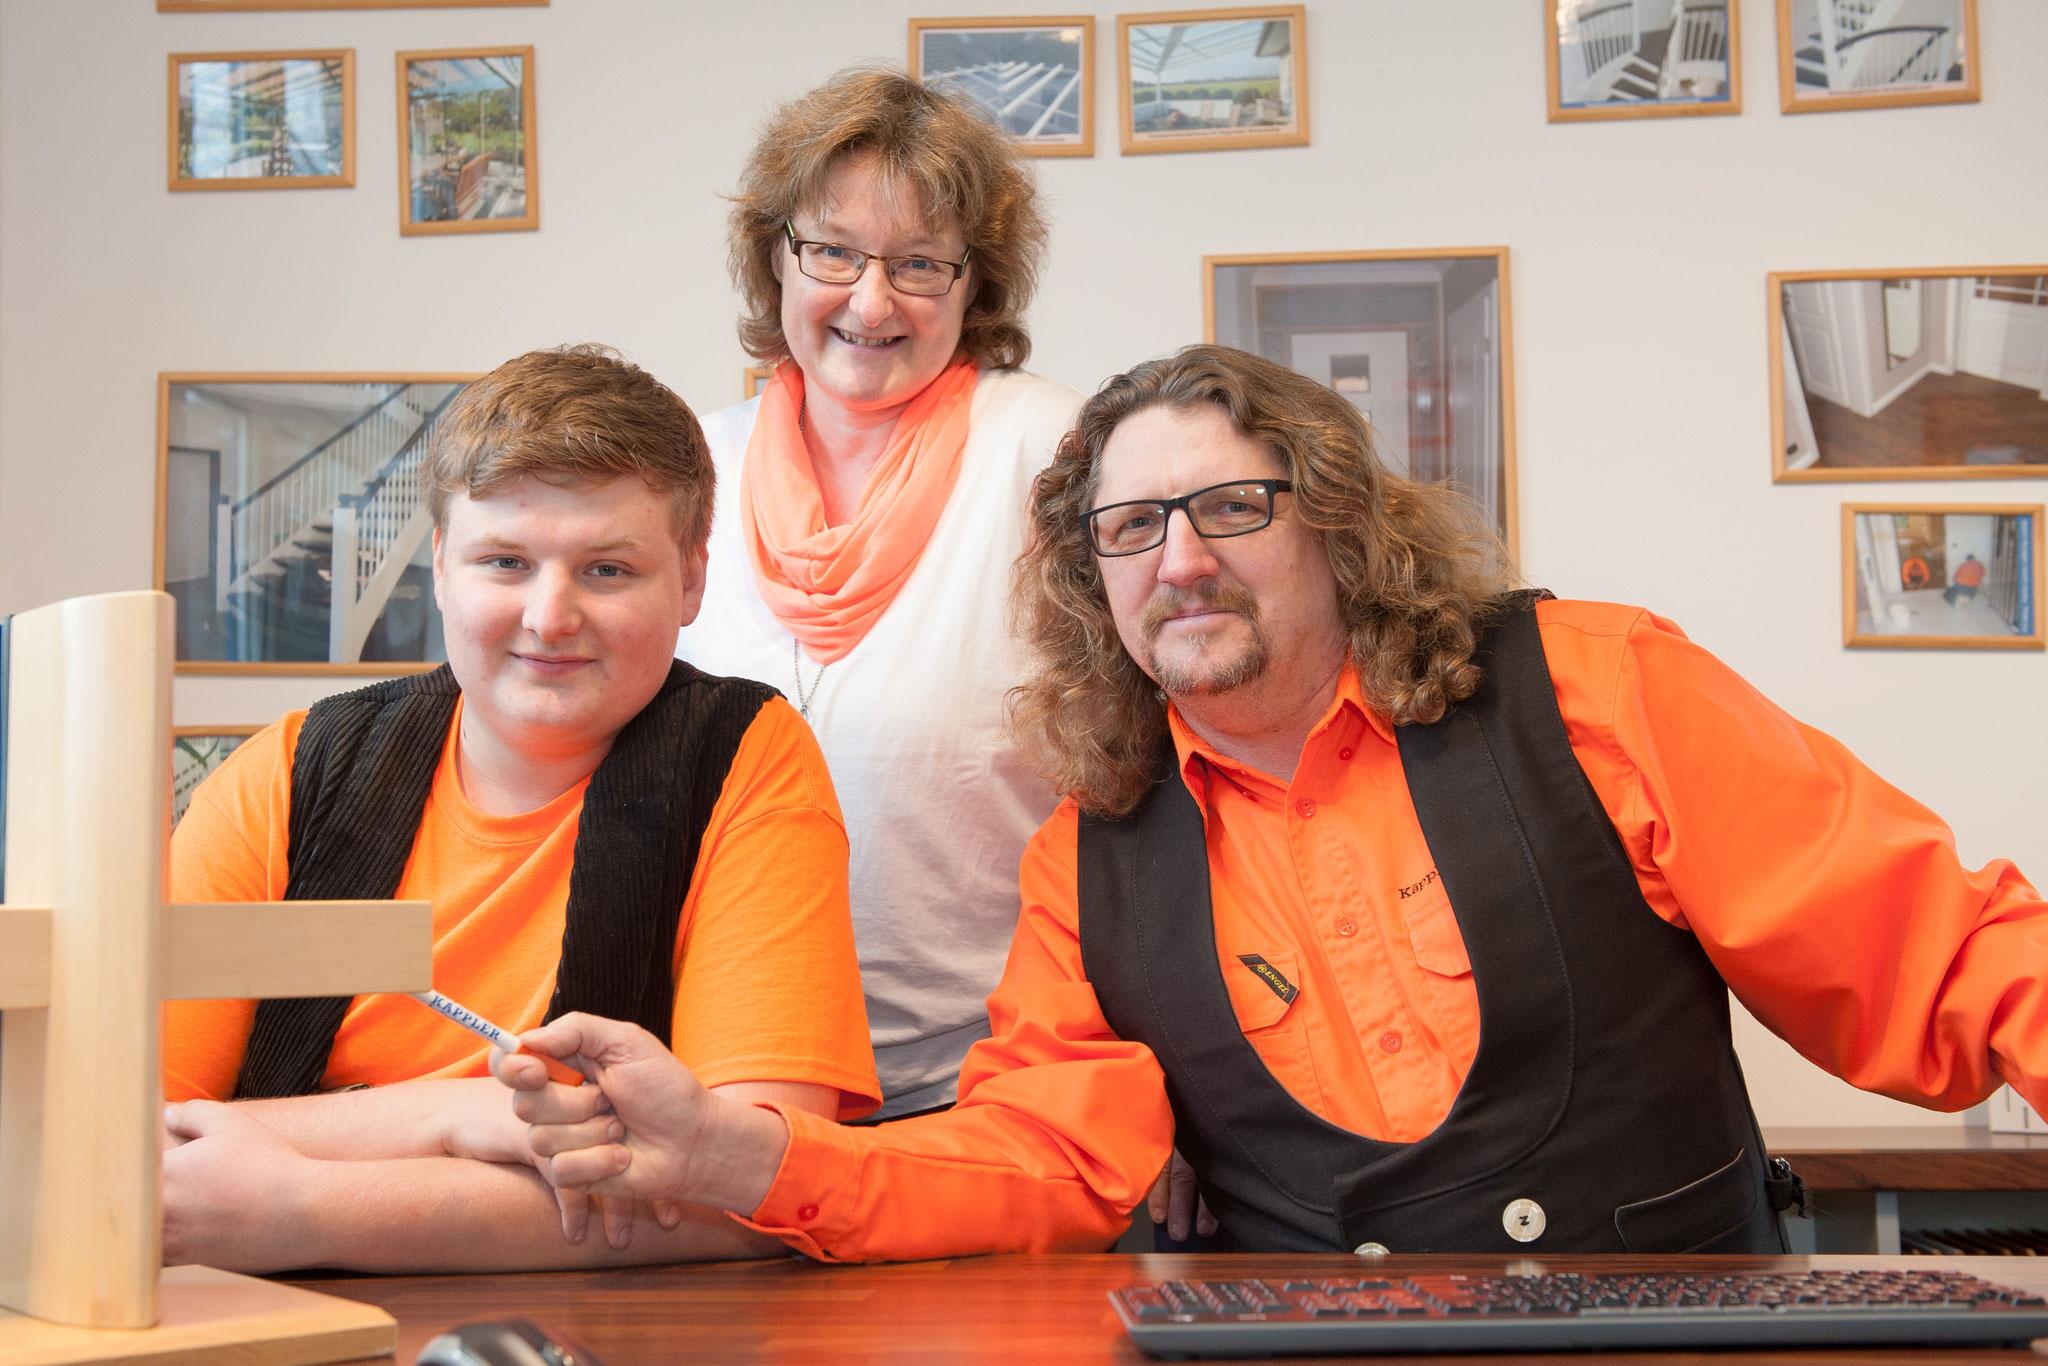 Familienunternehmen KÄPPLER BauTischlerei